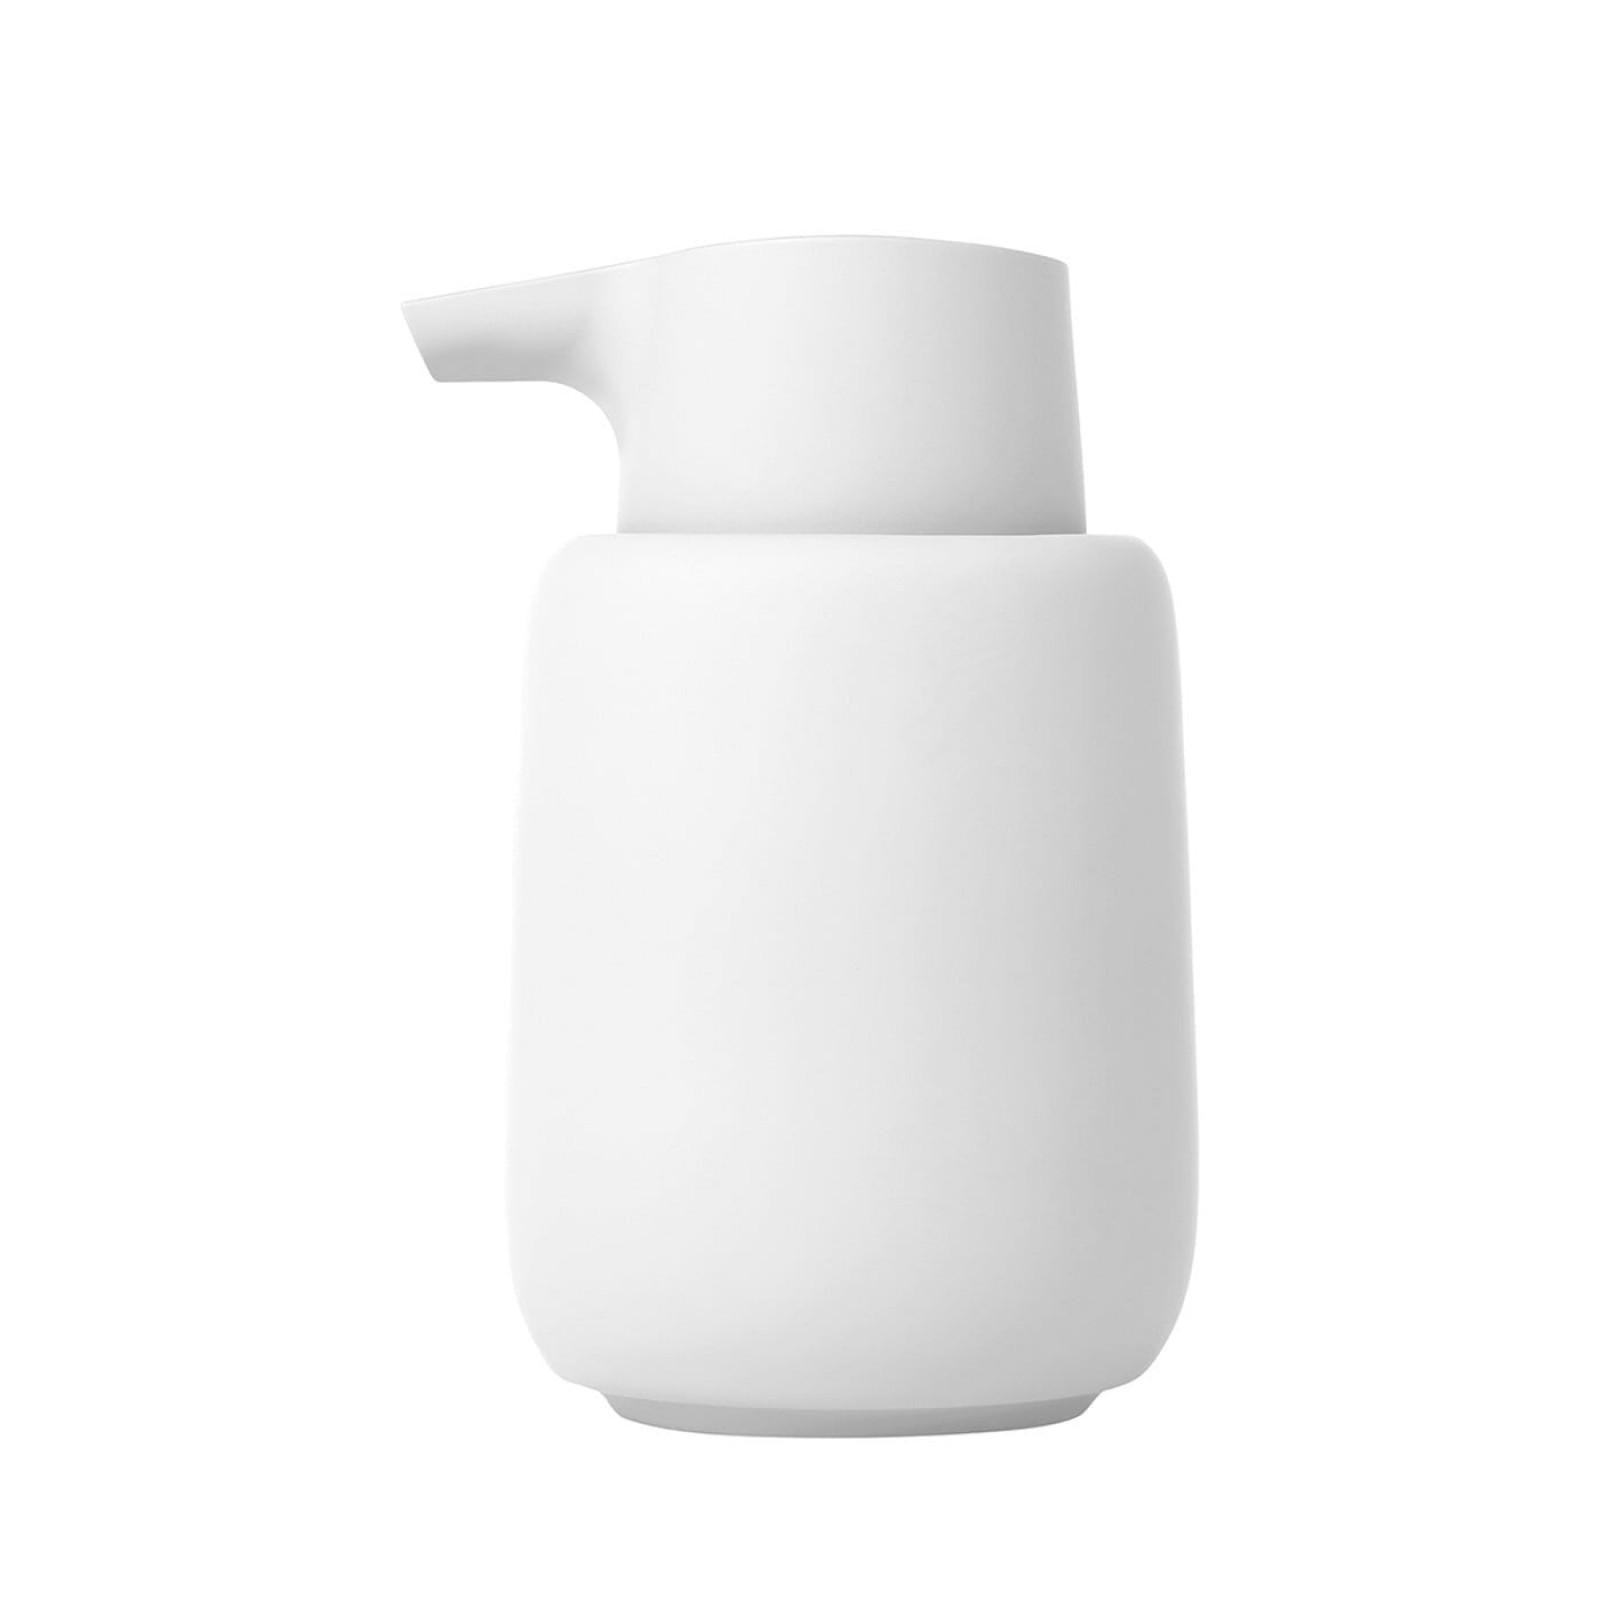 SONO Soap Dispenser (White) - Blomus